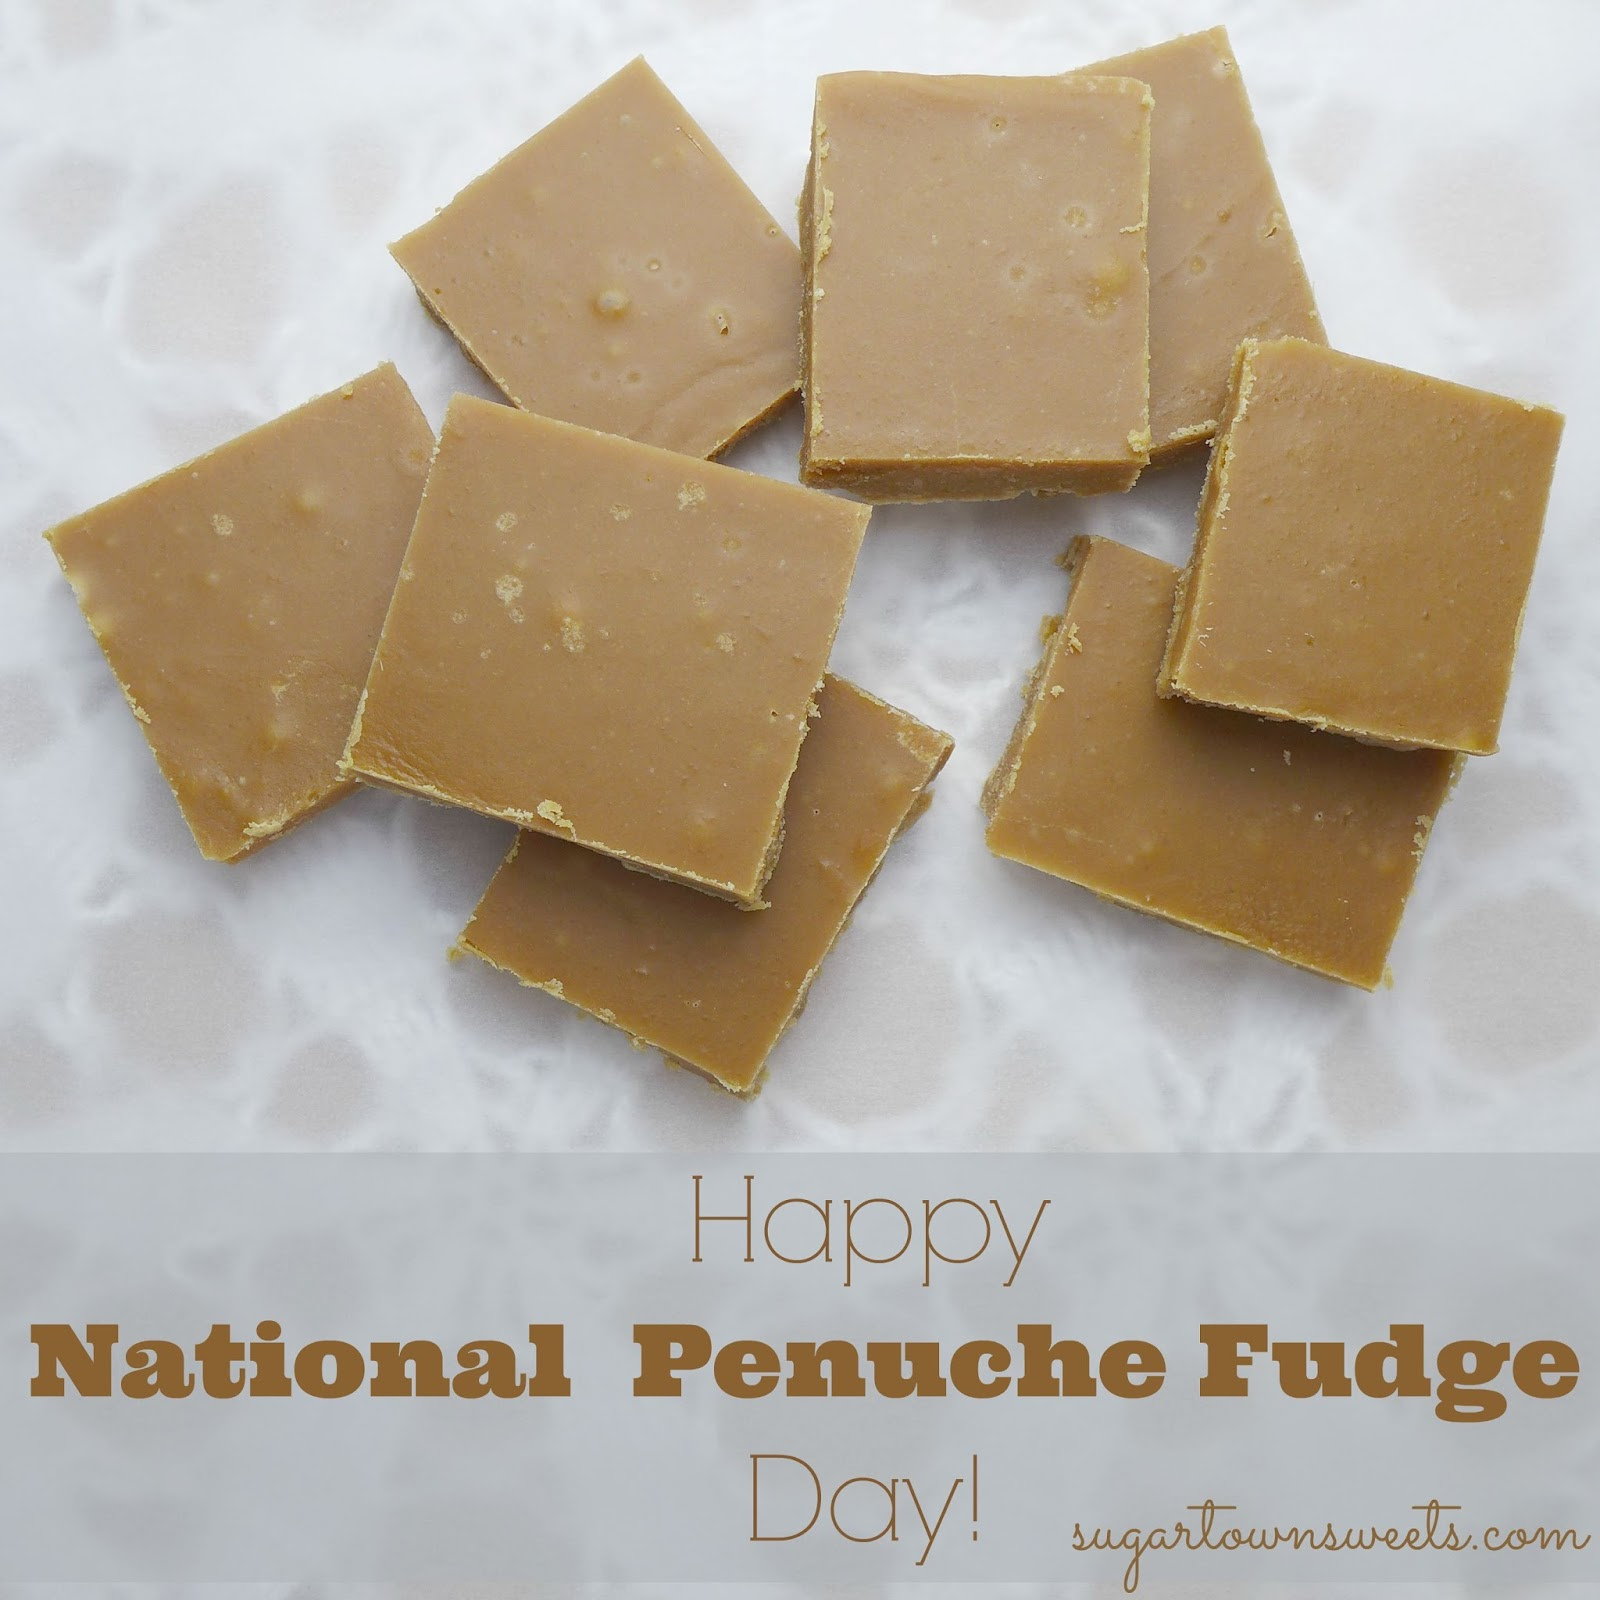 Sugartown Sweets: Happy National Penuche Fudge Day!